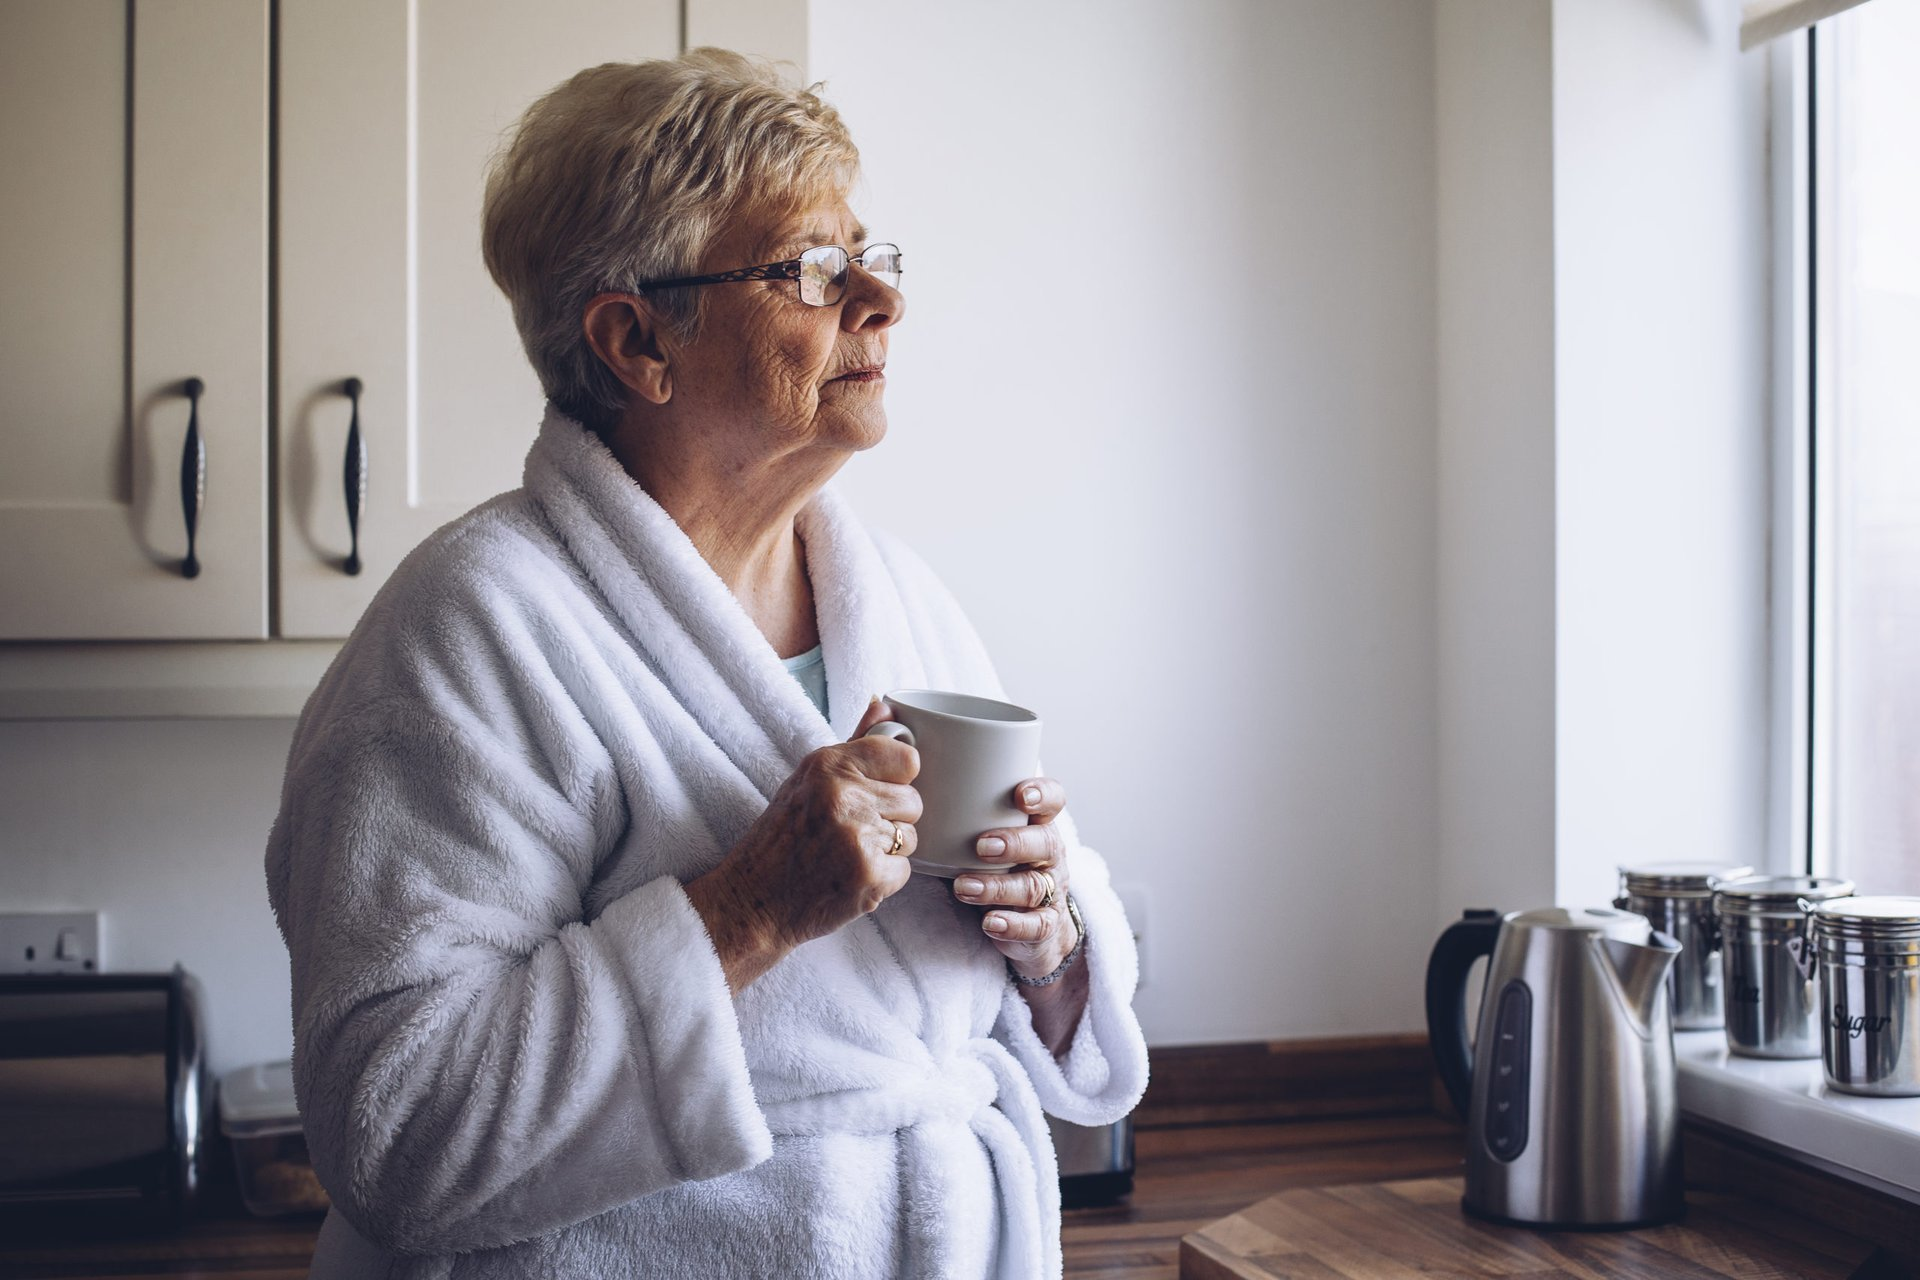 Sad senior woman drinking coffee